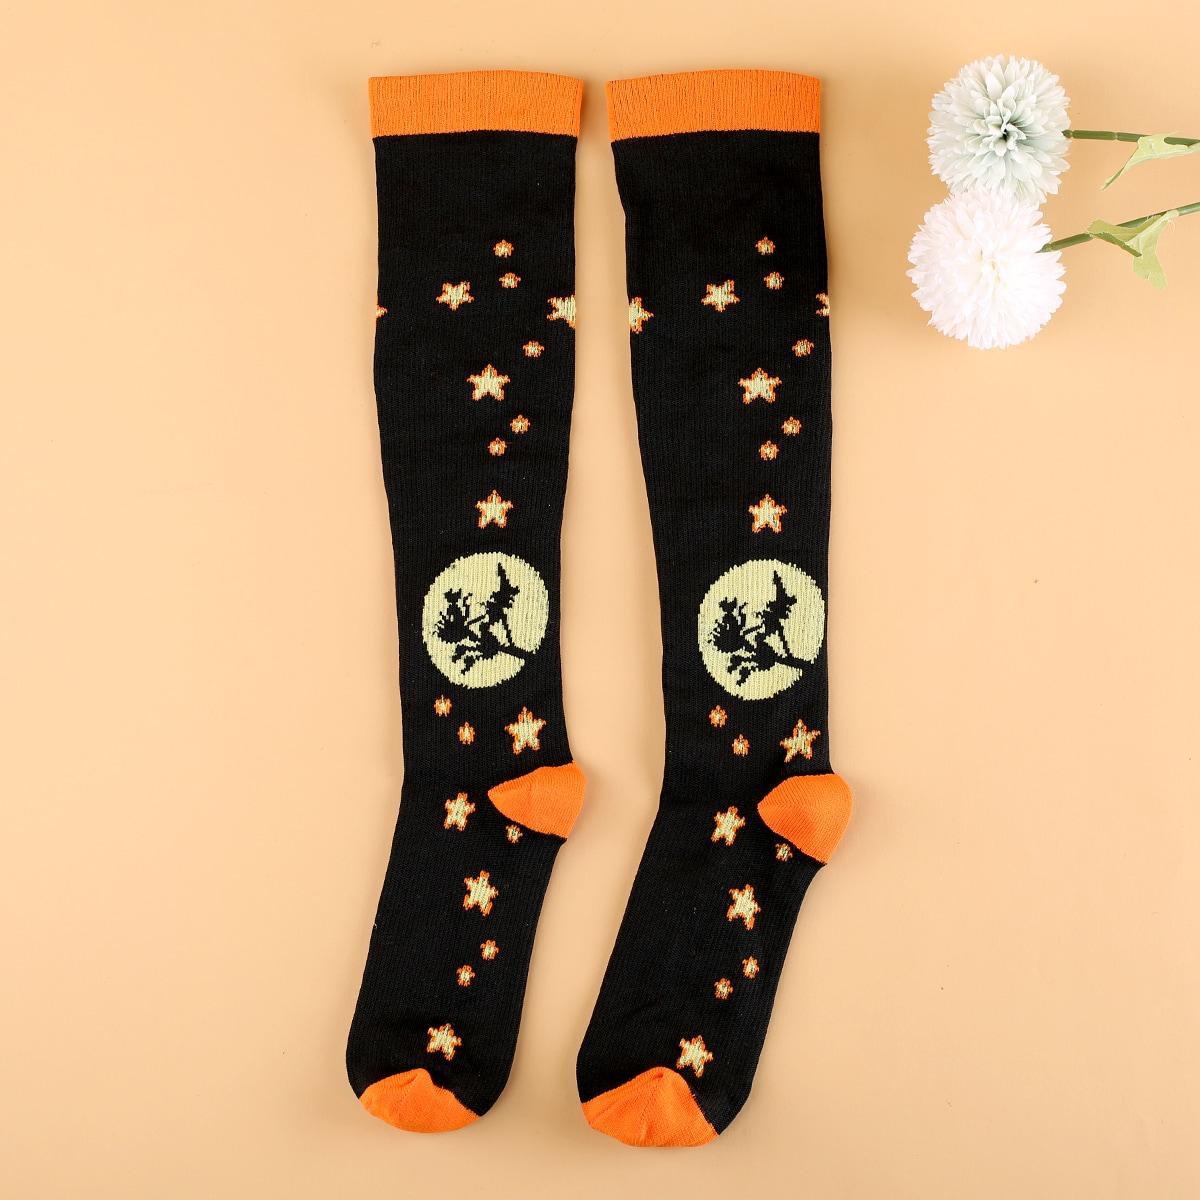 Носки выше голени на хэллоуин с рисунком